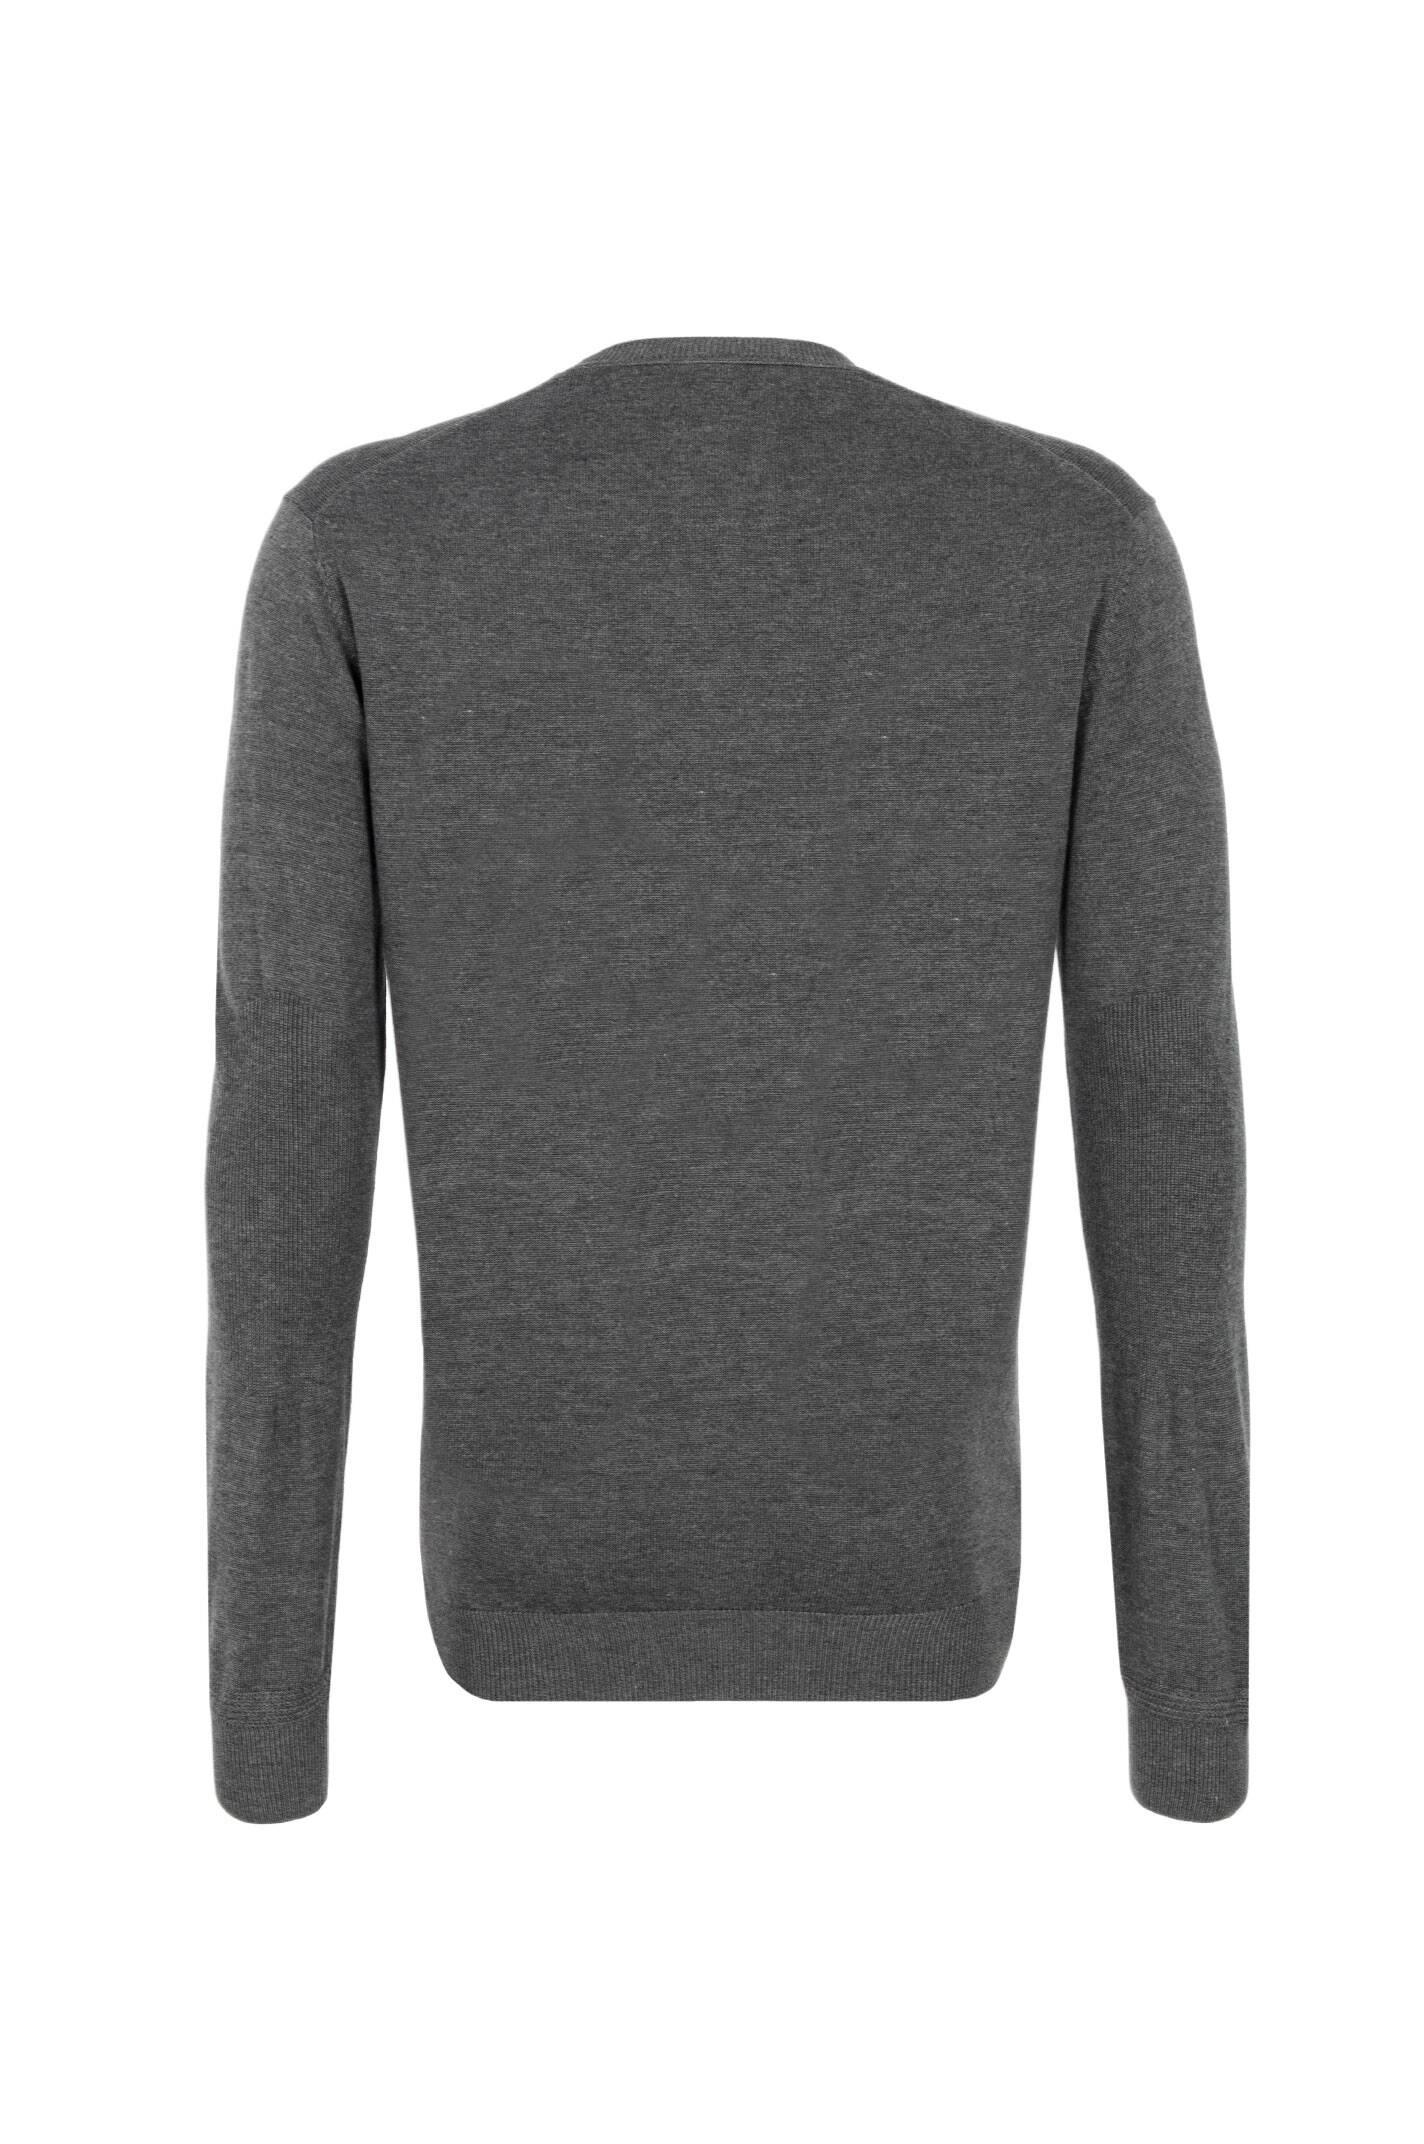 berlow sweater g star raw gray knitwear. Black Bedroom Furniture Sets. Home Design Ideas